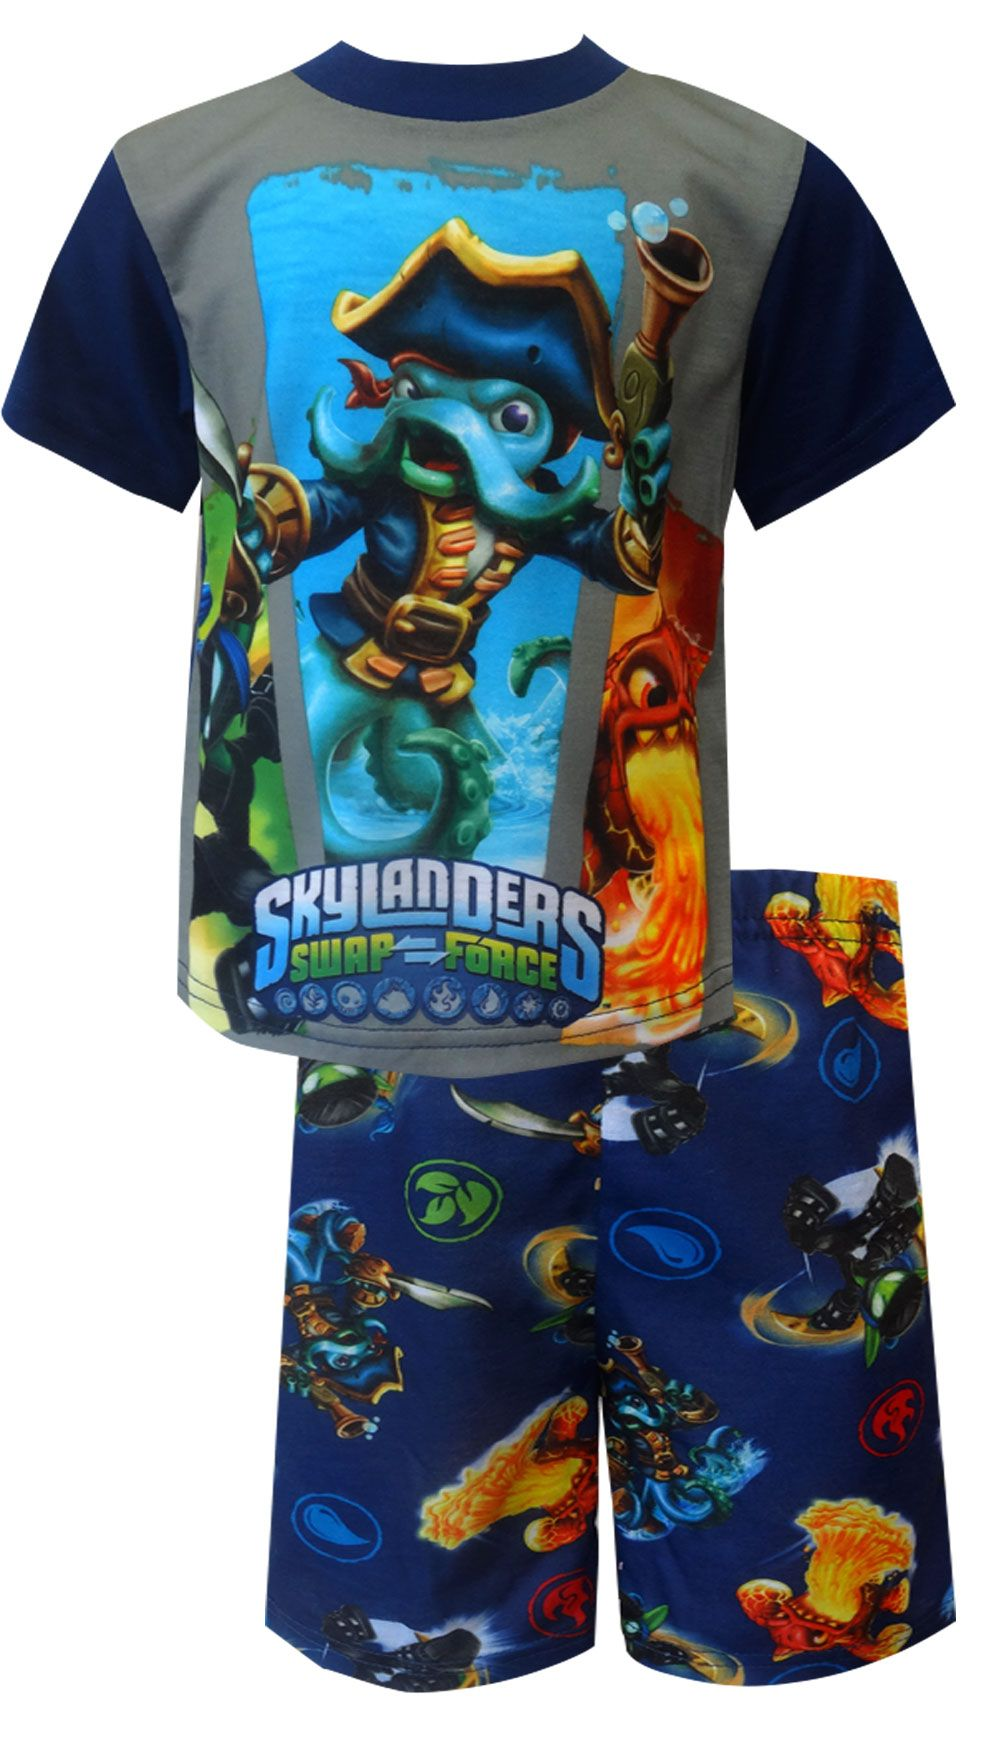 6016d5975 Skylanders Swap Force Ninja Stealth Elf and Wash Buckler Pajamas He will  love playing his favorite video game in these pajamas!